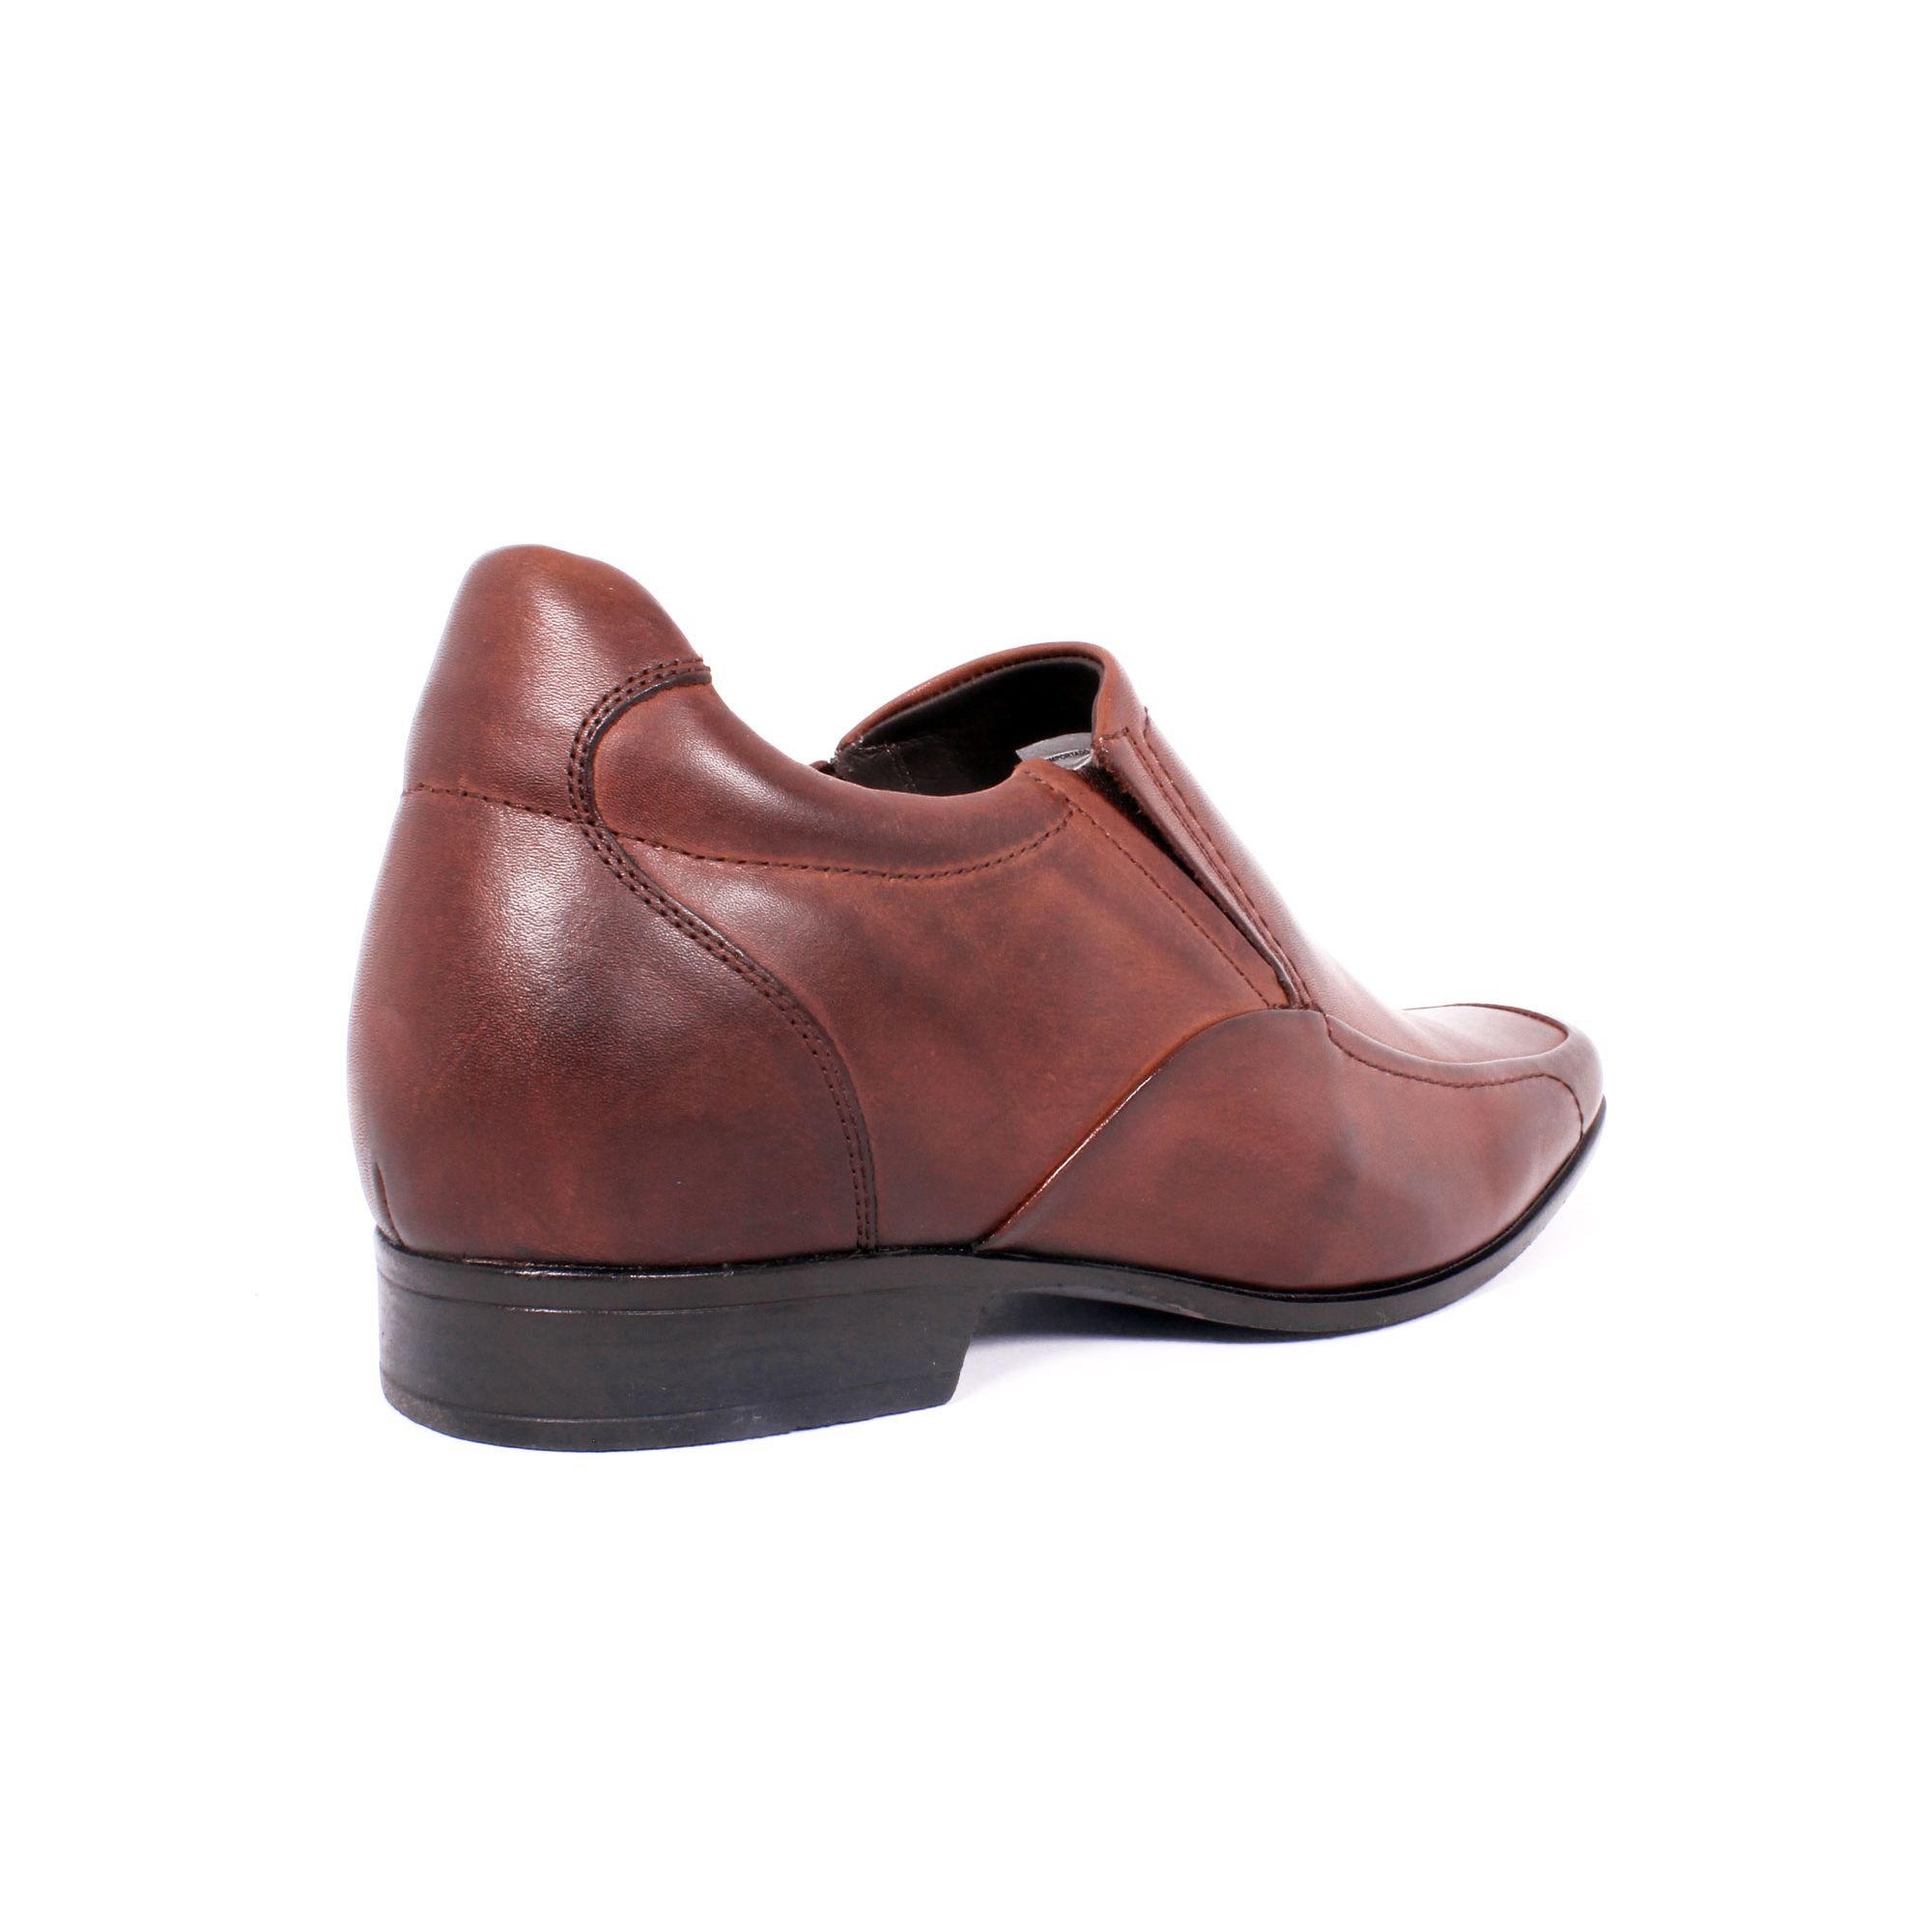 Zapato Formal Tabaco Café Max Denegri +7cms de Altura_70847